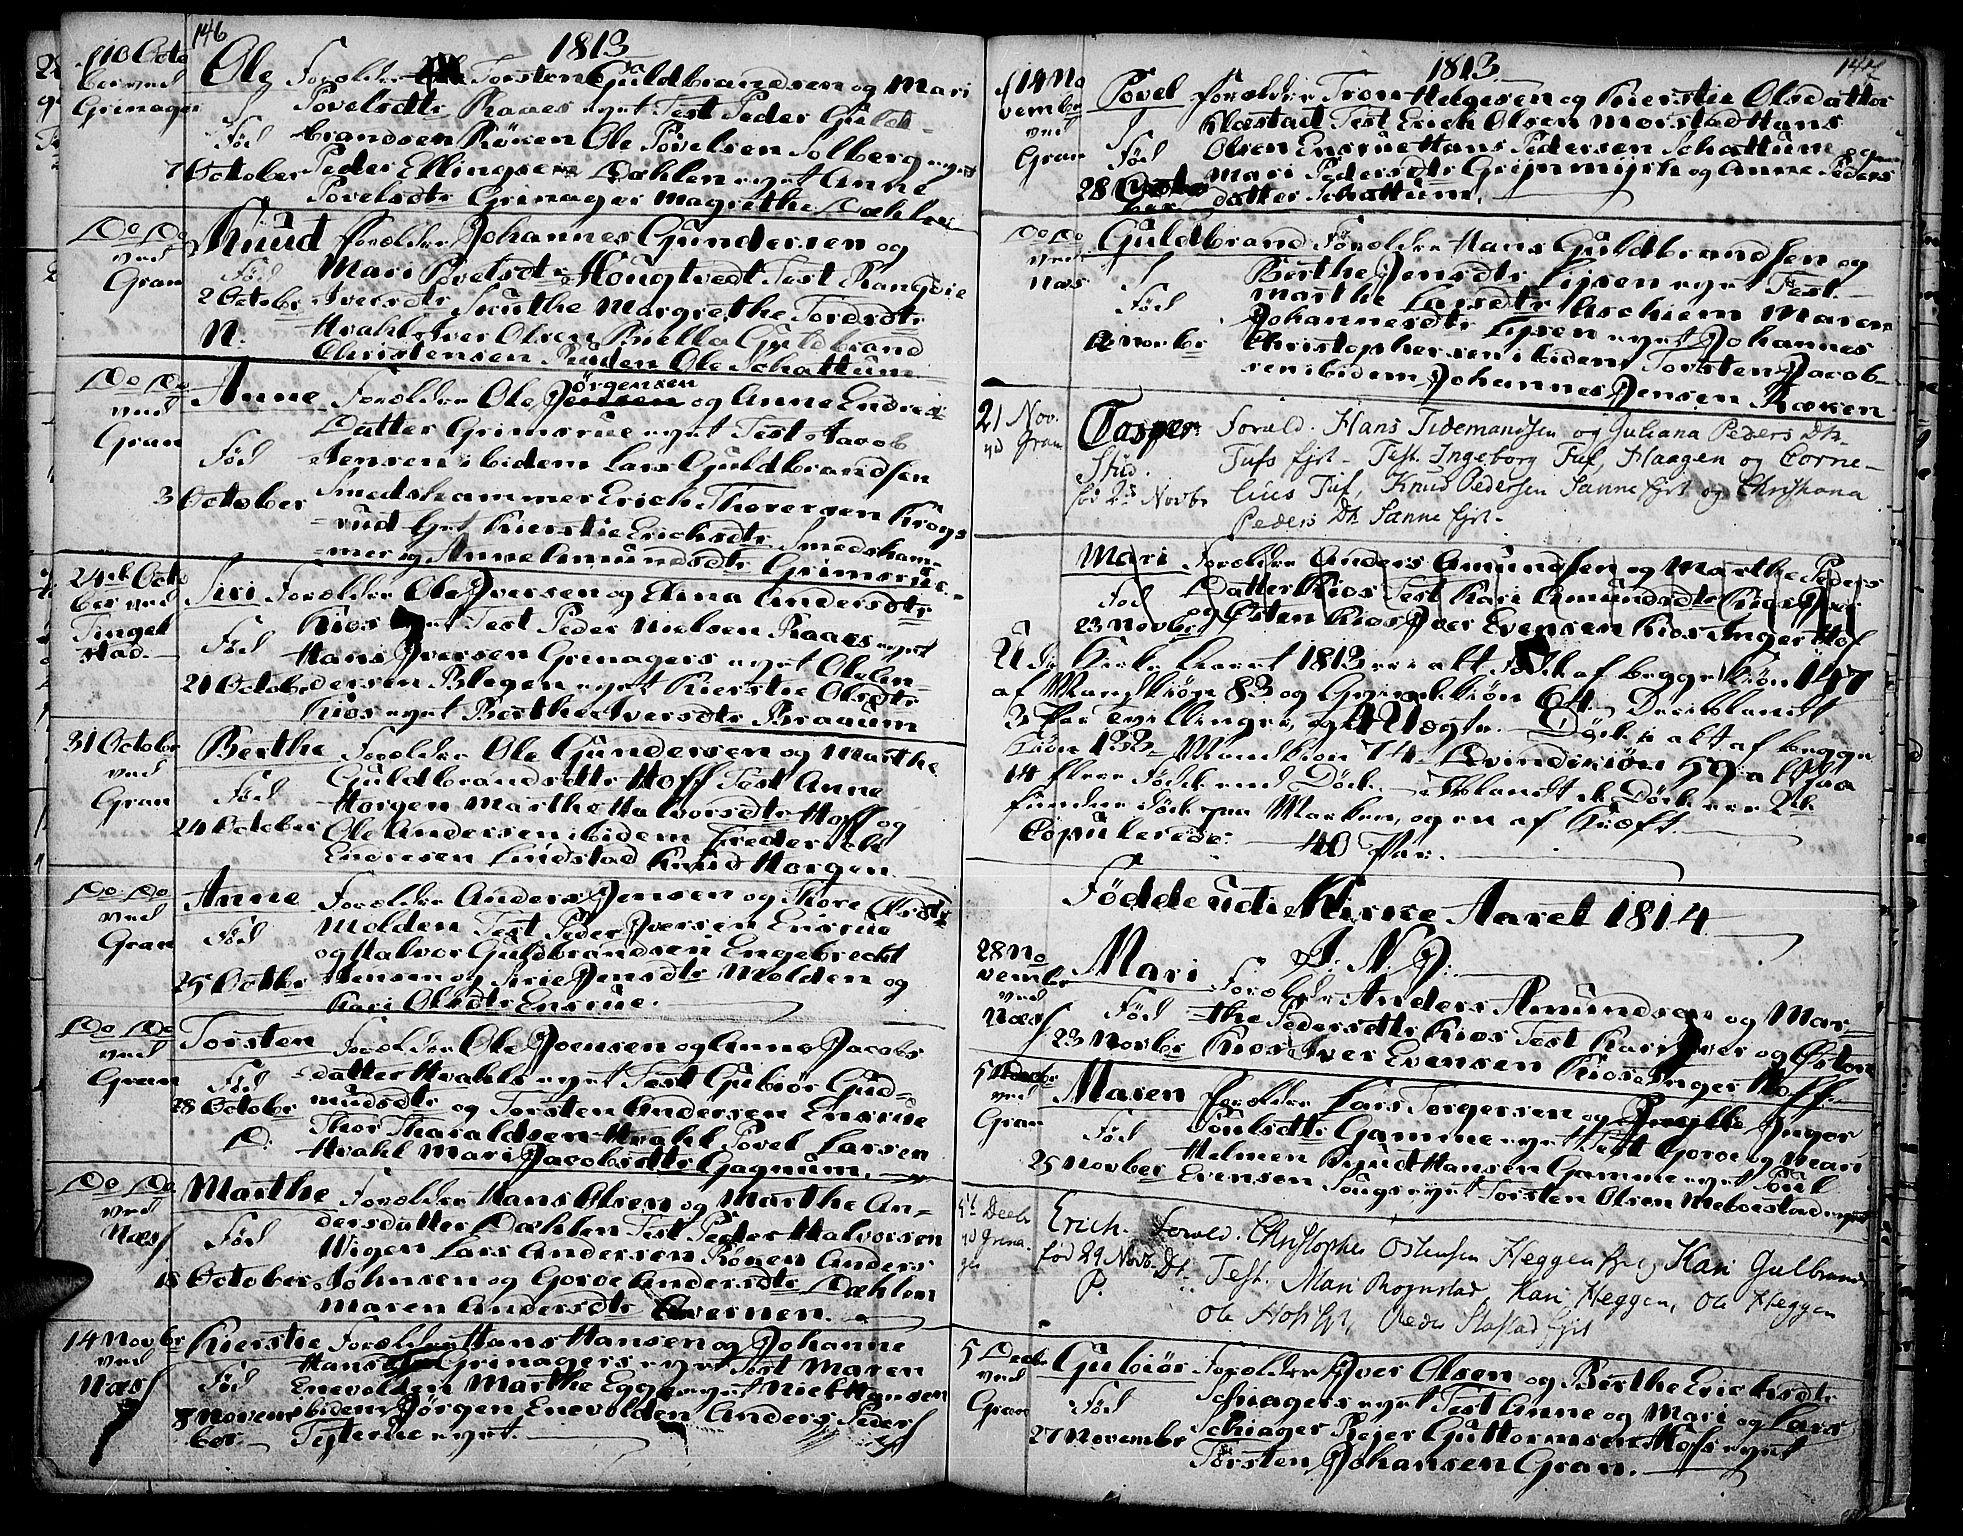 SAH, Gran prestekontor, Ministerialbok nr. 7, 1804-1815, s. 146-147